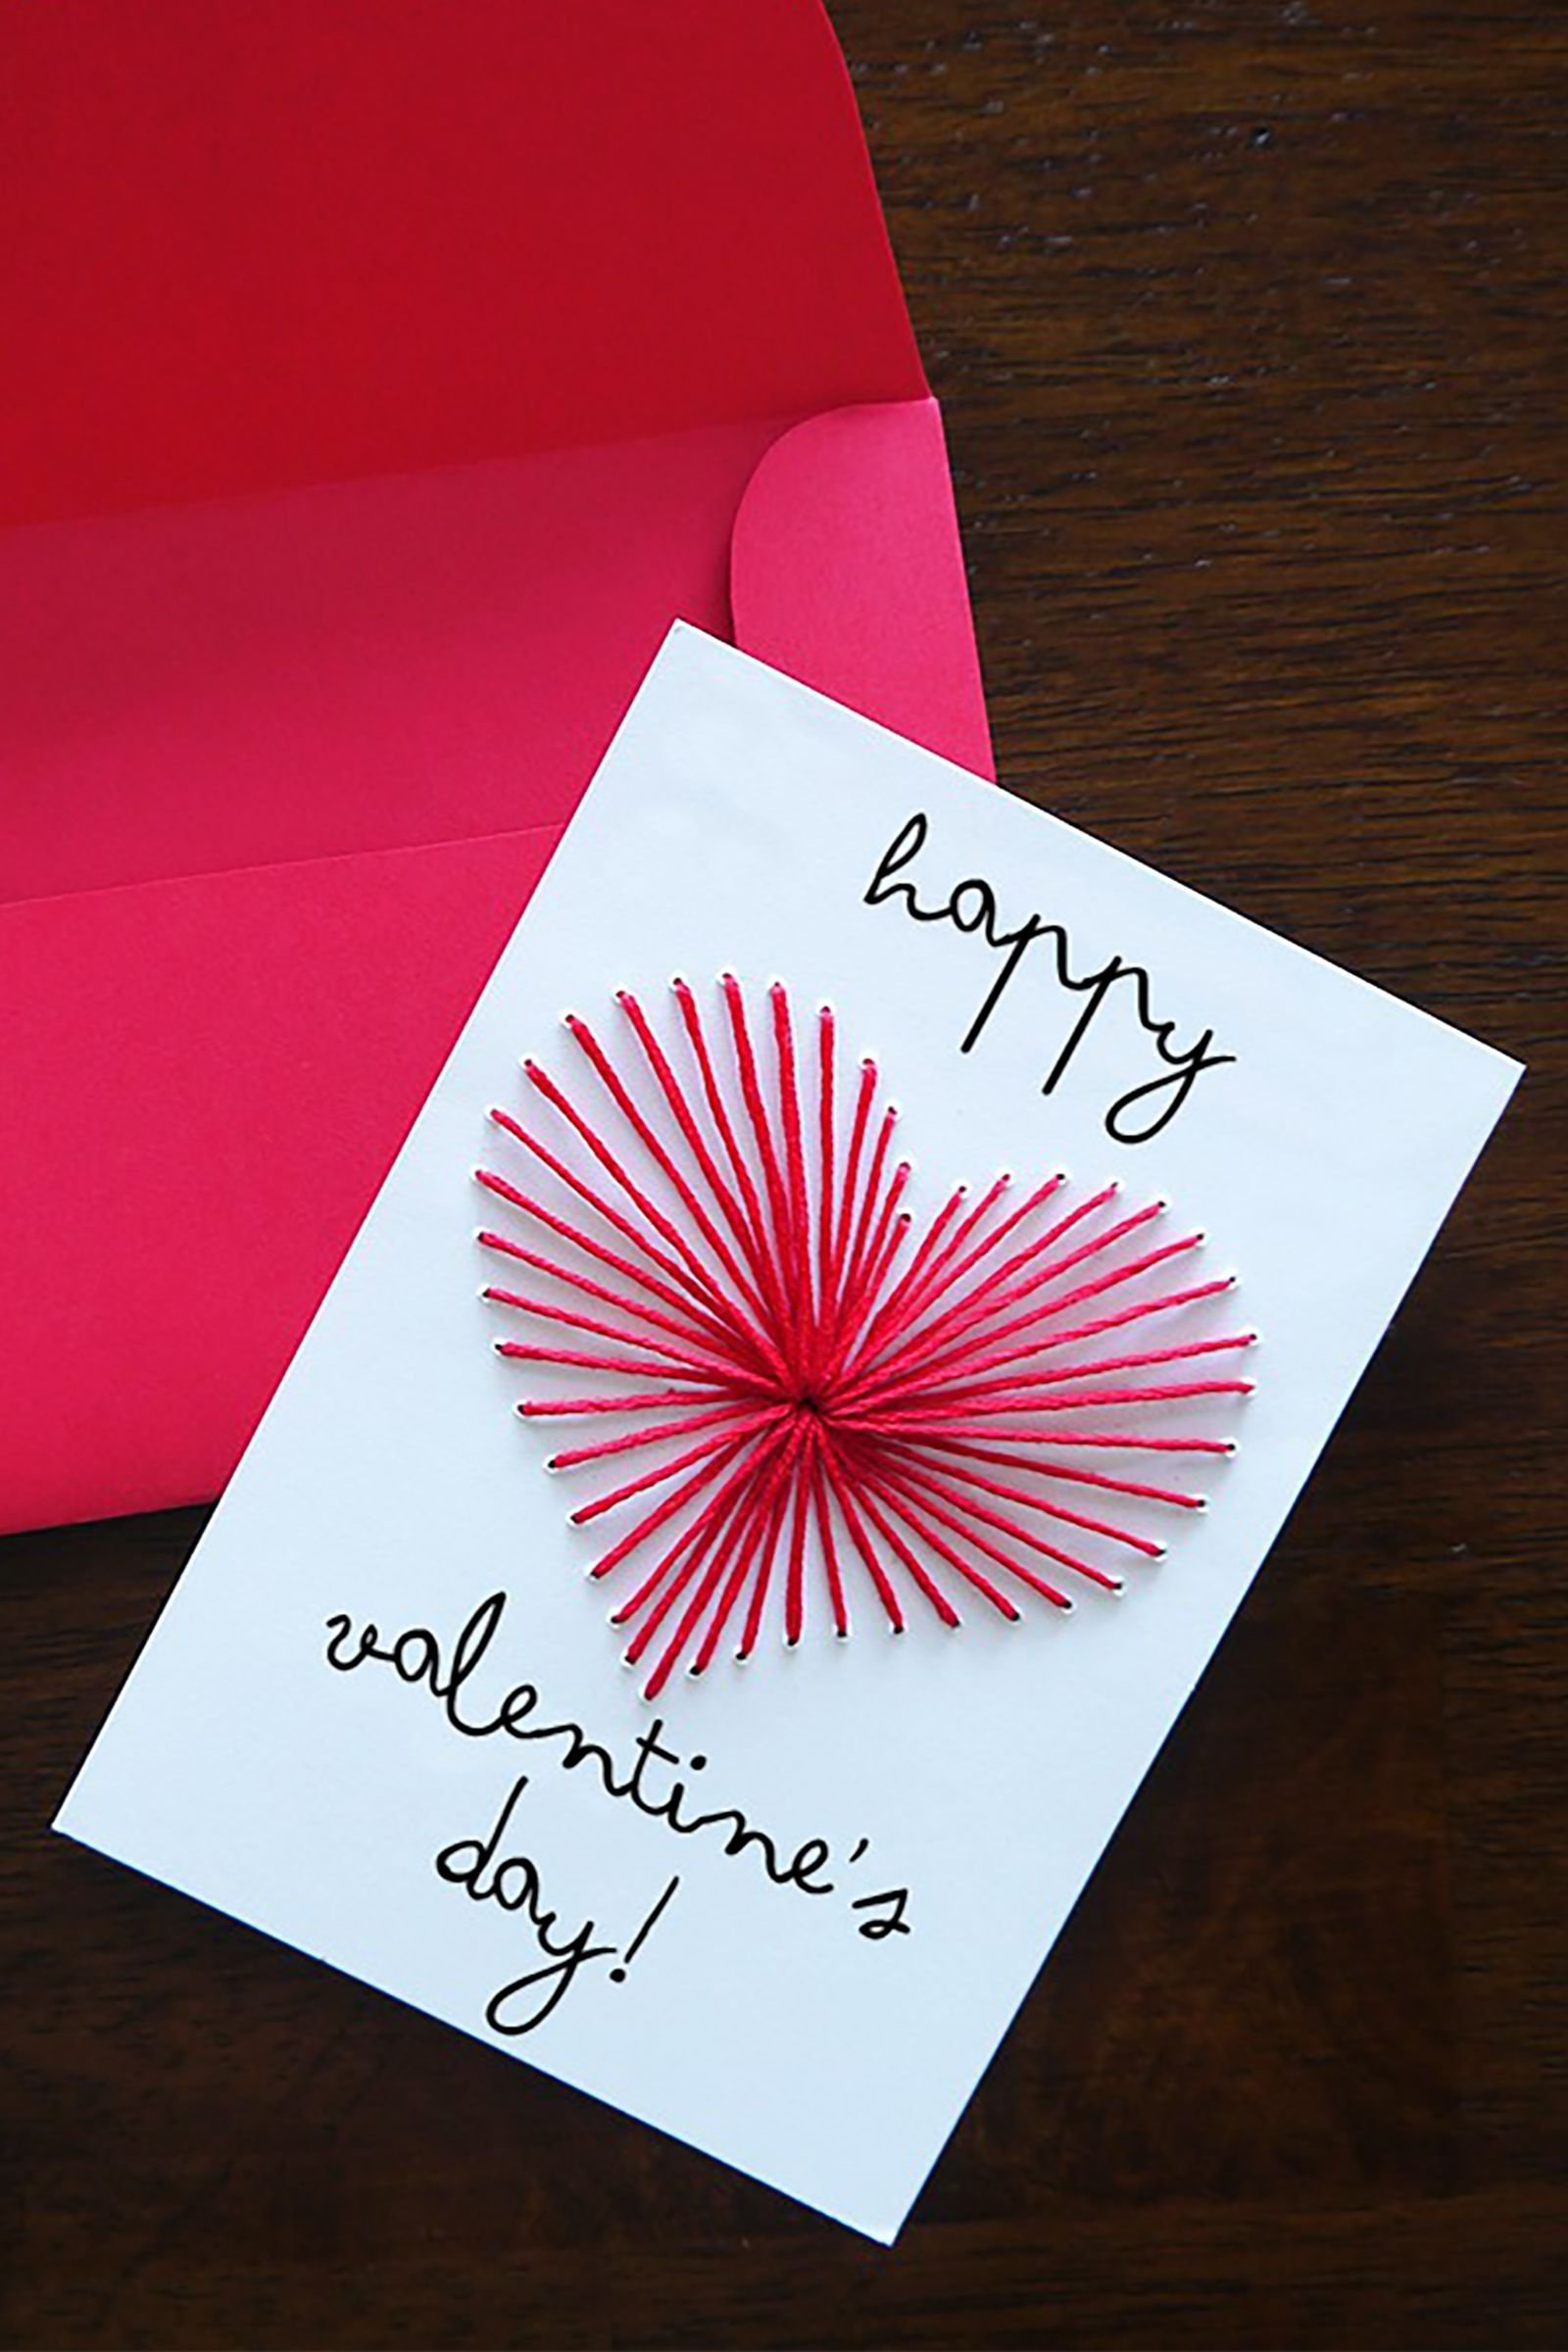 10 Best Homemade Valentines Day Card Ideas 26 diy valentines day cards homemade valentines country living 1 2020